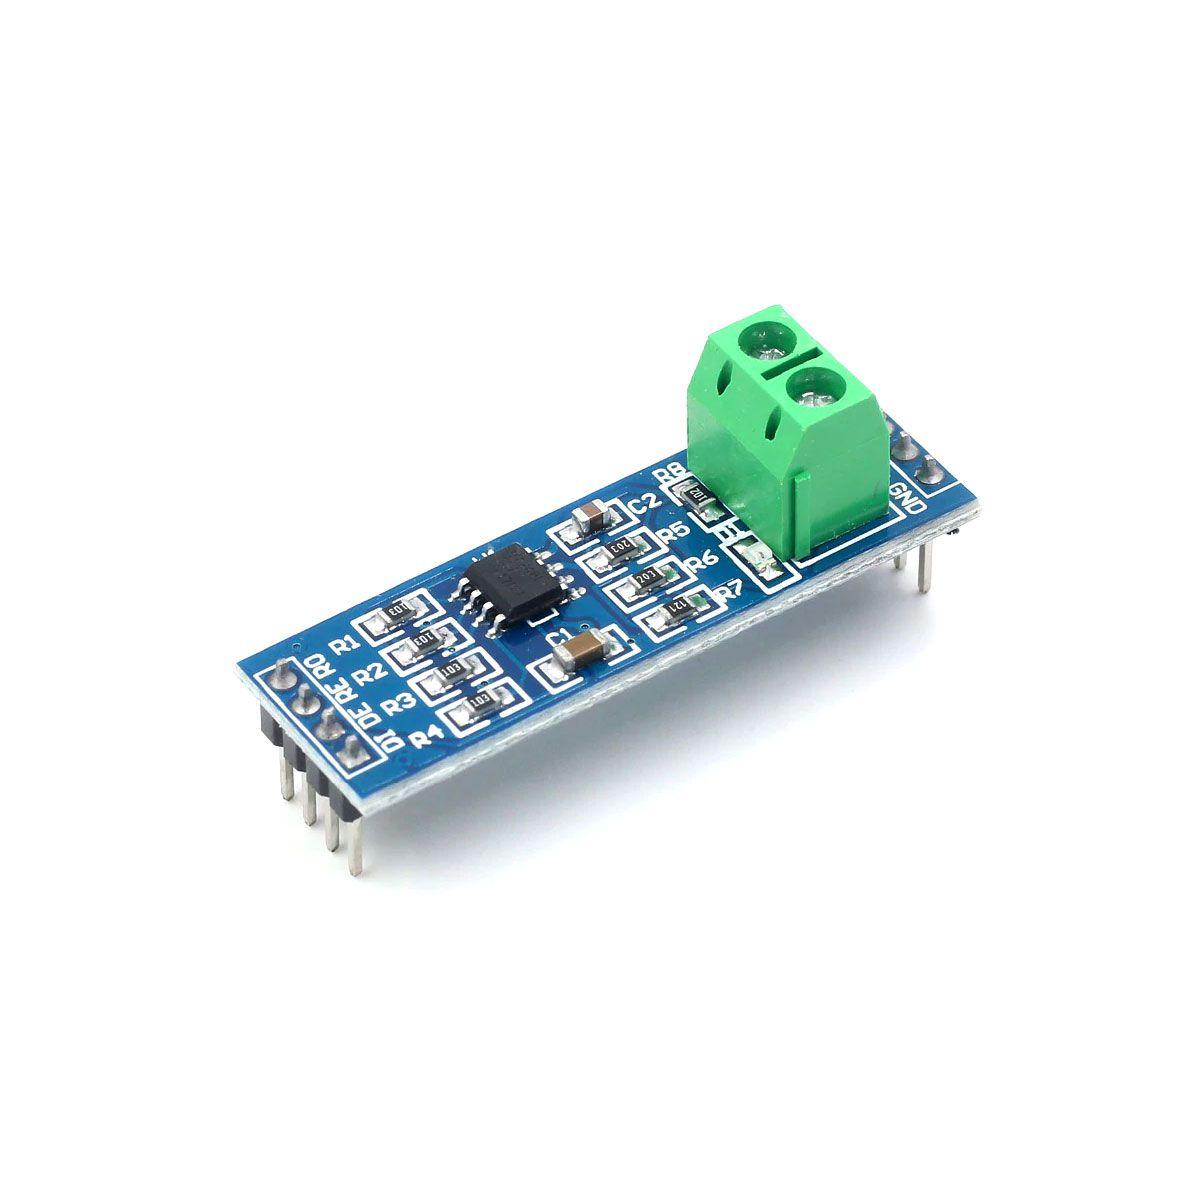 Conversor de dados TTL para RS485 - CDT11